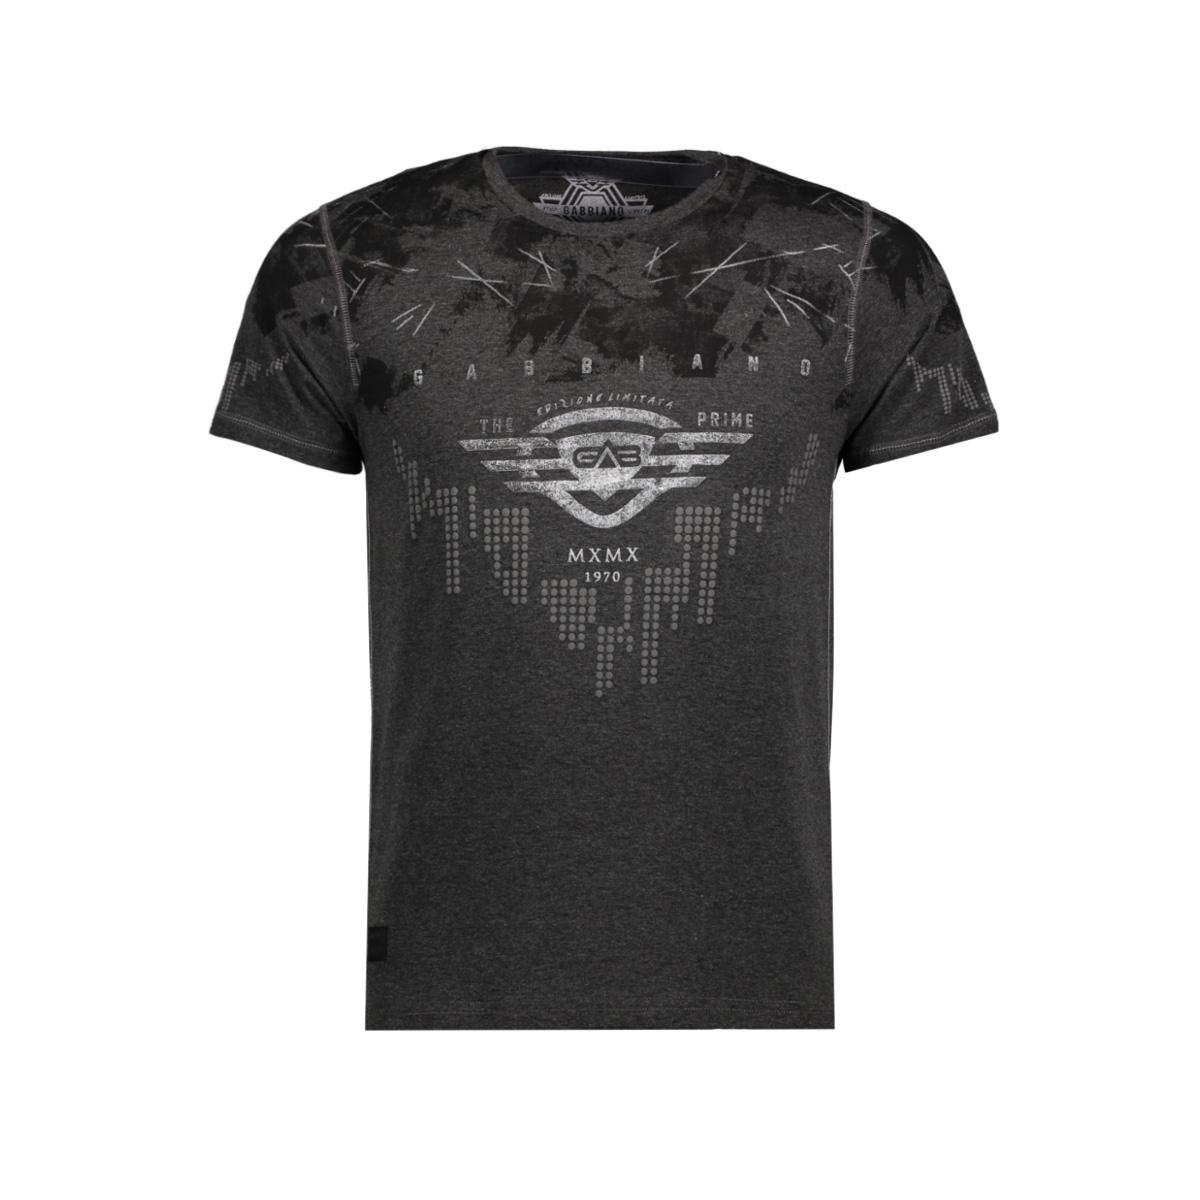 13881 gabbiano t-shirt antra